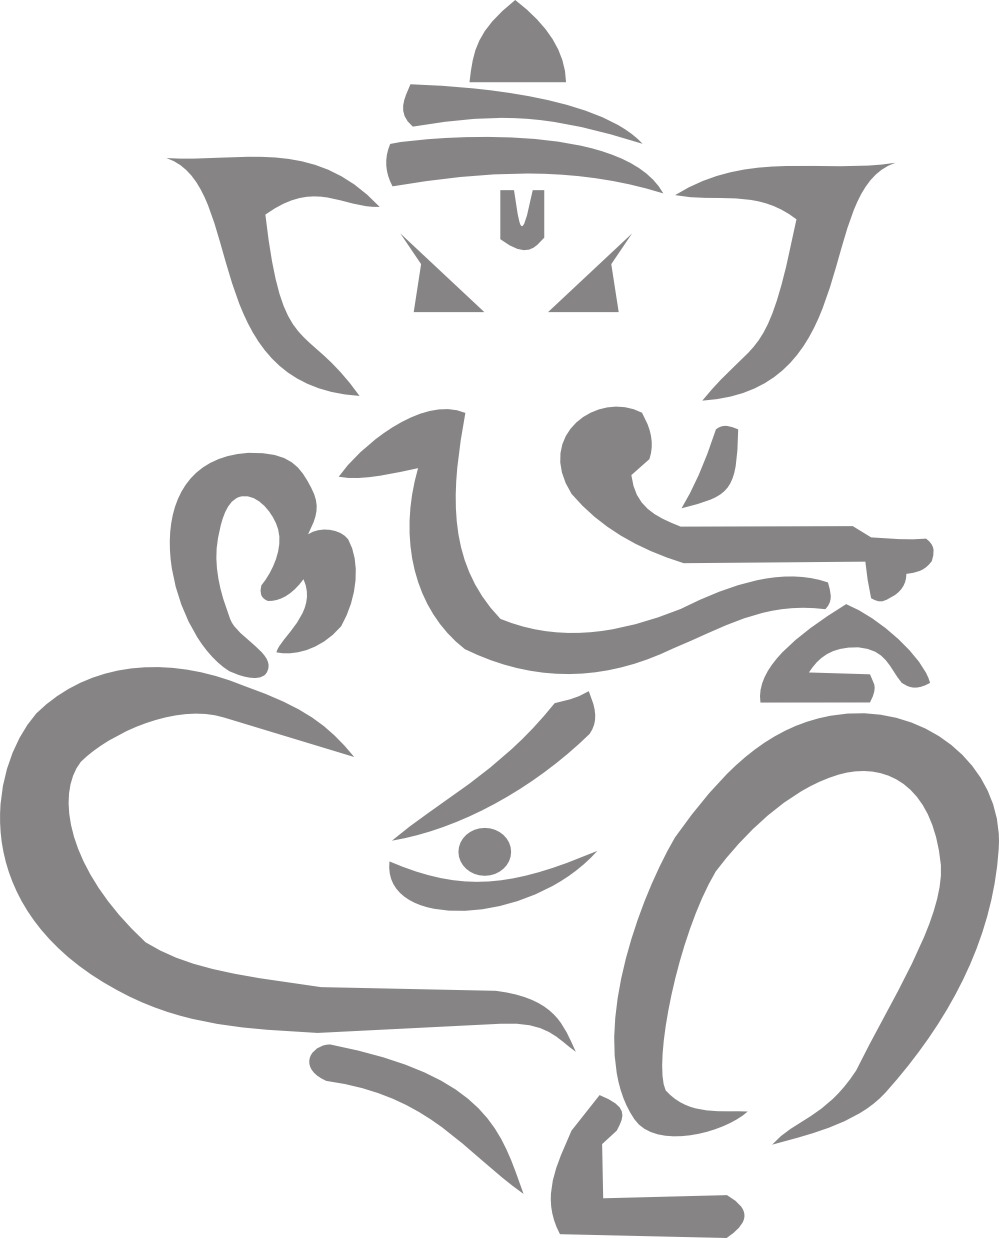 Vinayaka clipart images clip art freeuse Clip Art: lord ganesha yoga ganesh black white ... - ClipArt Best ... clip art freeuse